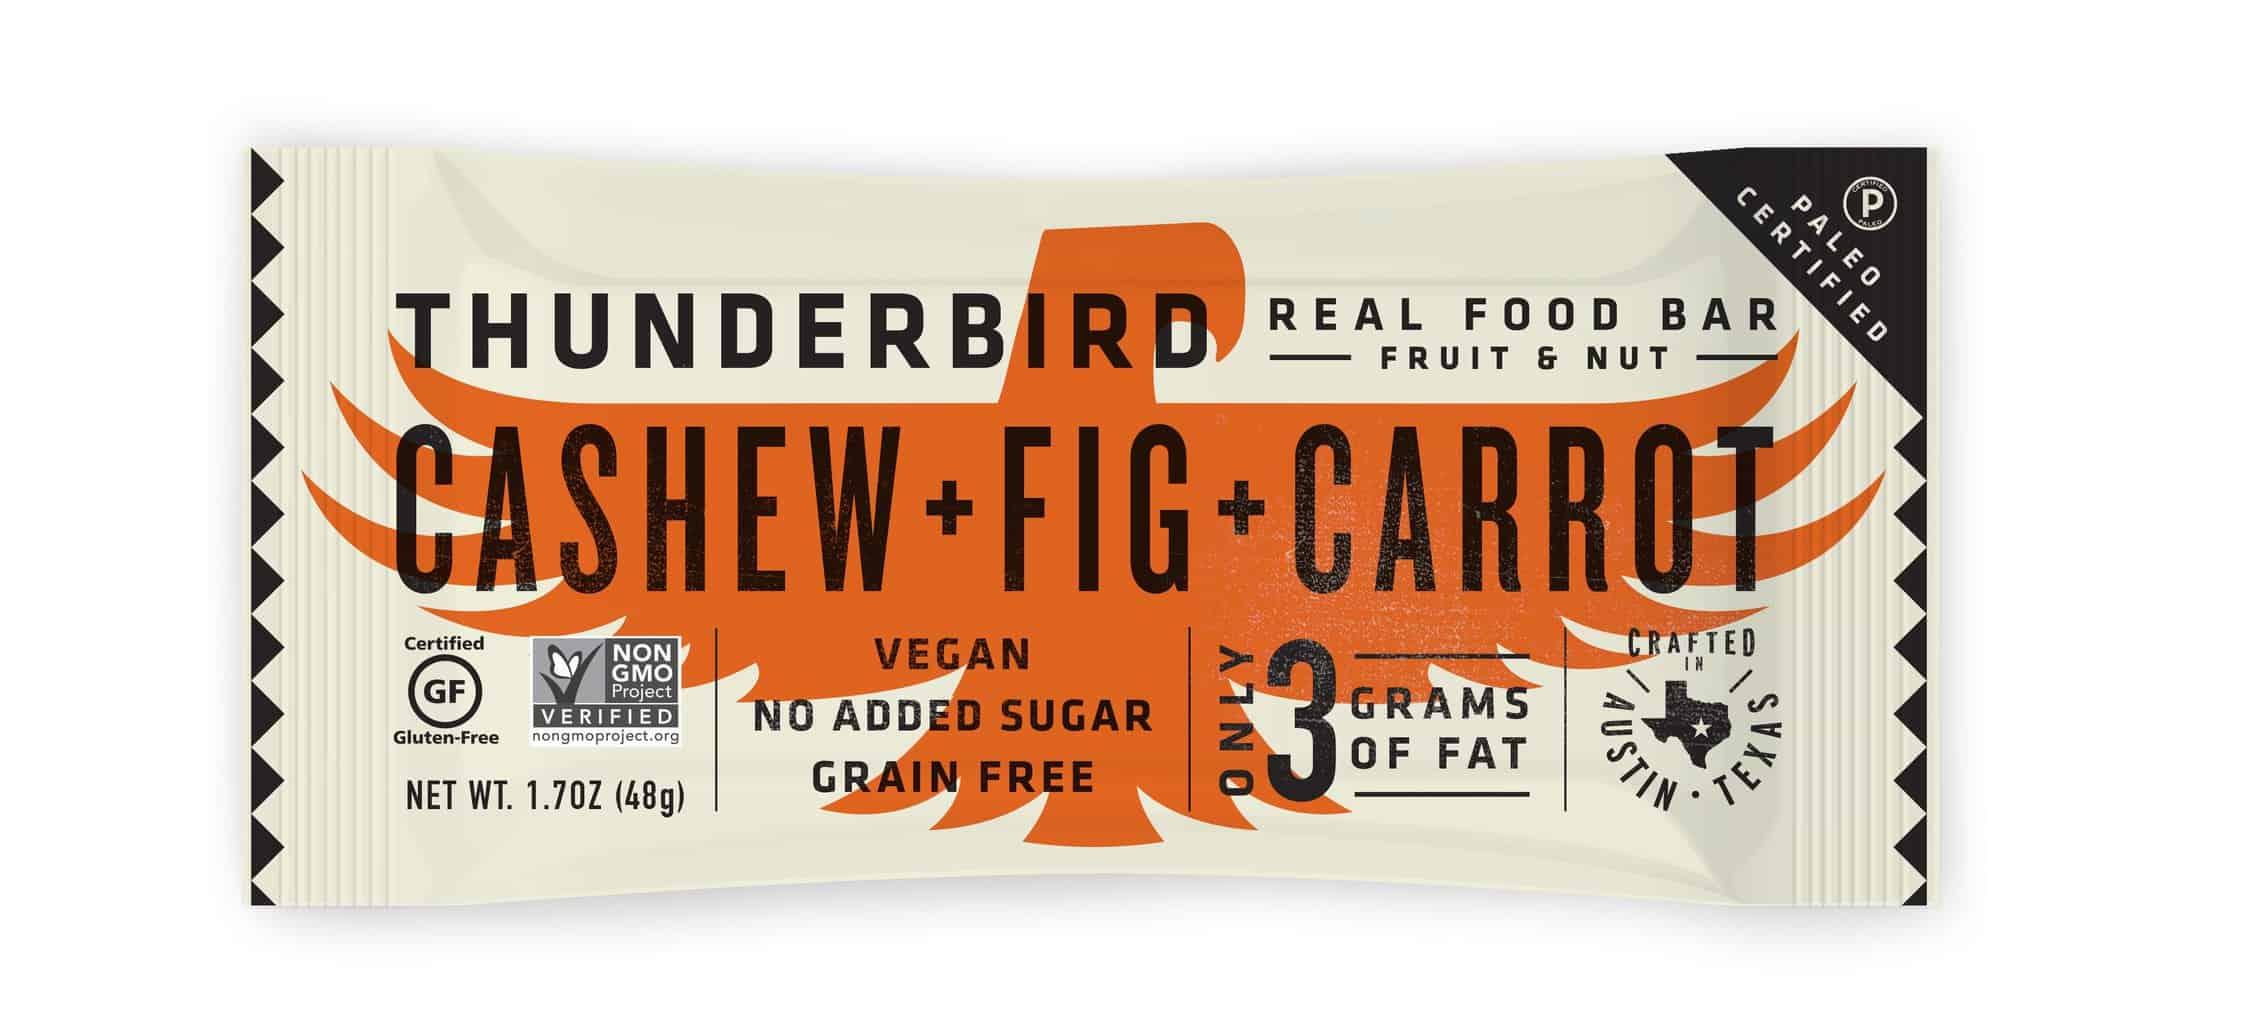 Thunderbird-15% off code USALOVE #vegan #grainfee #whole30 #paleo